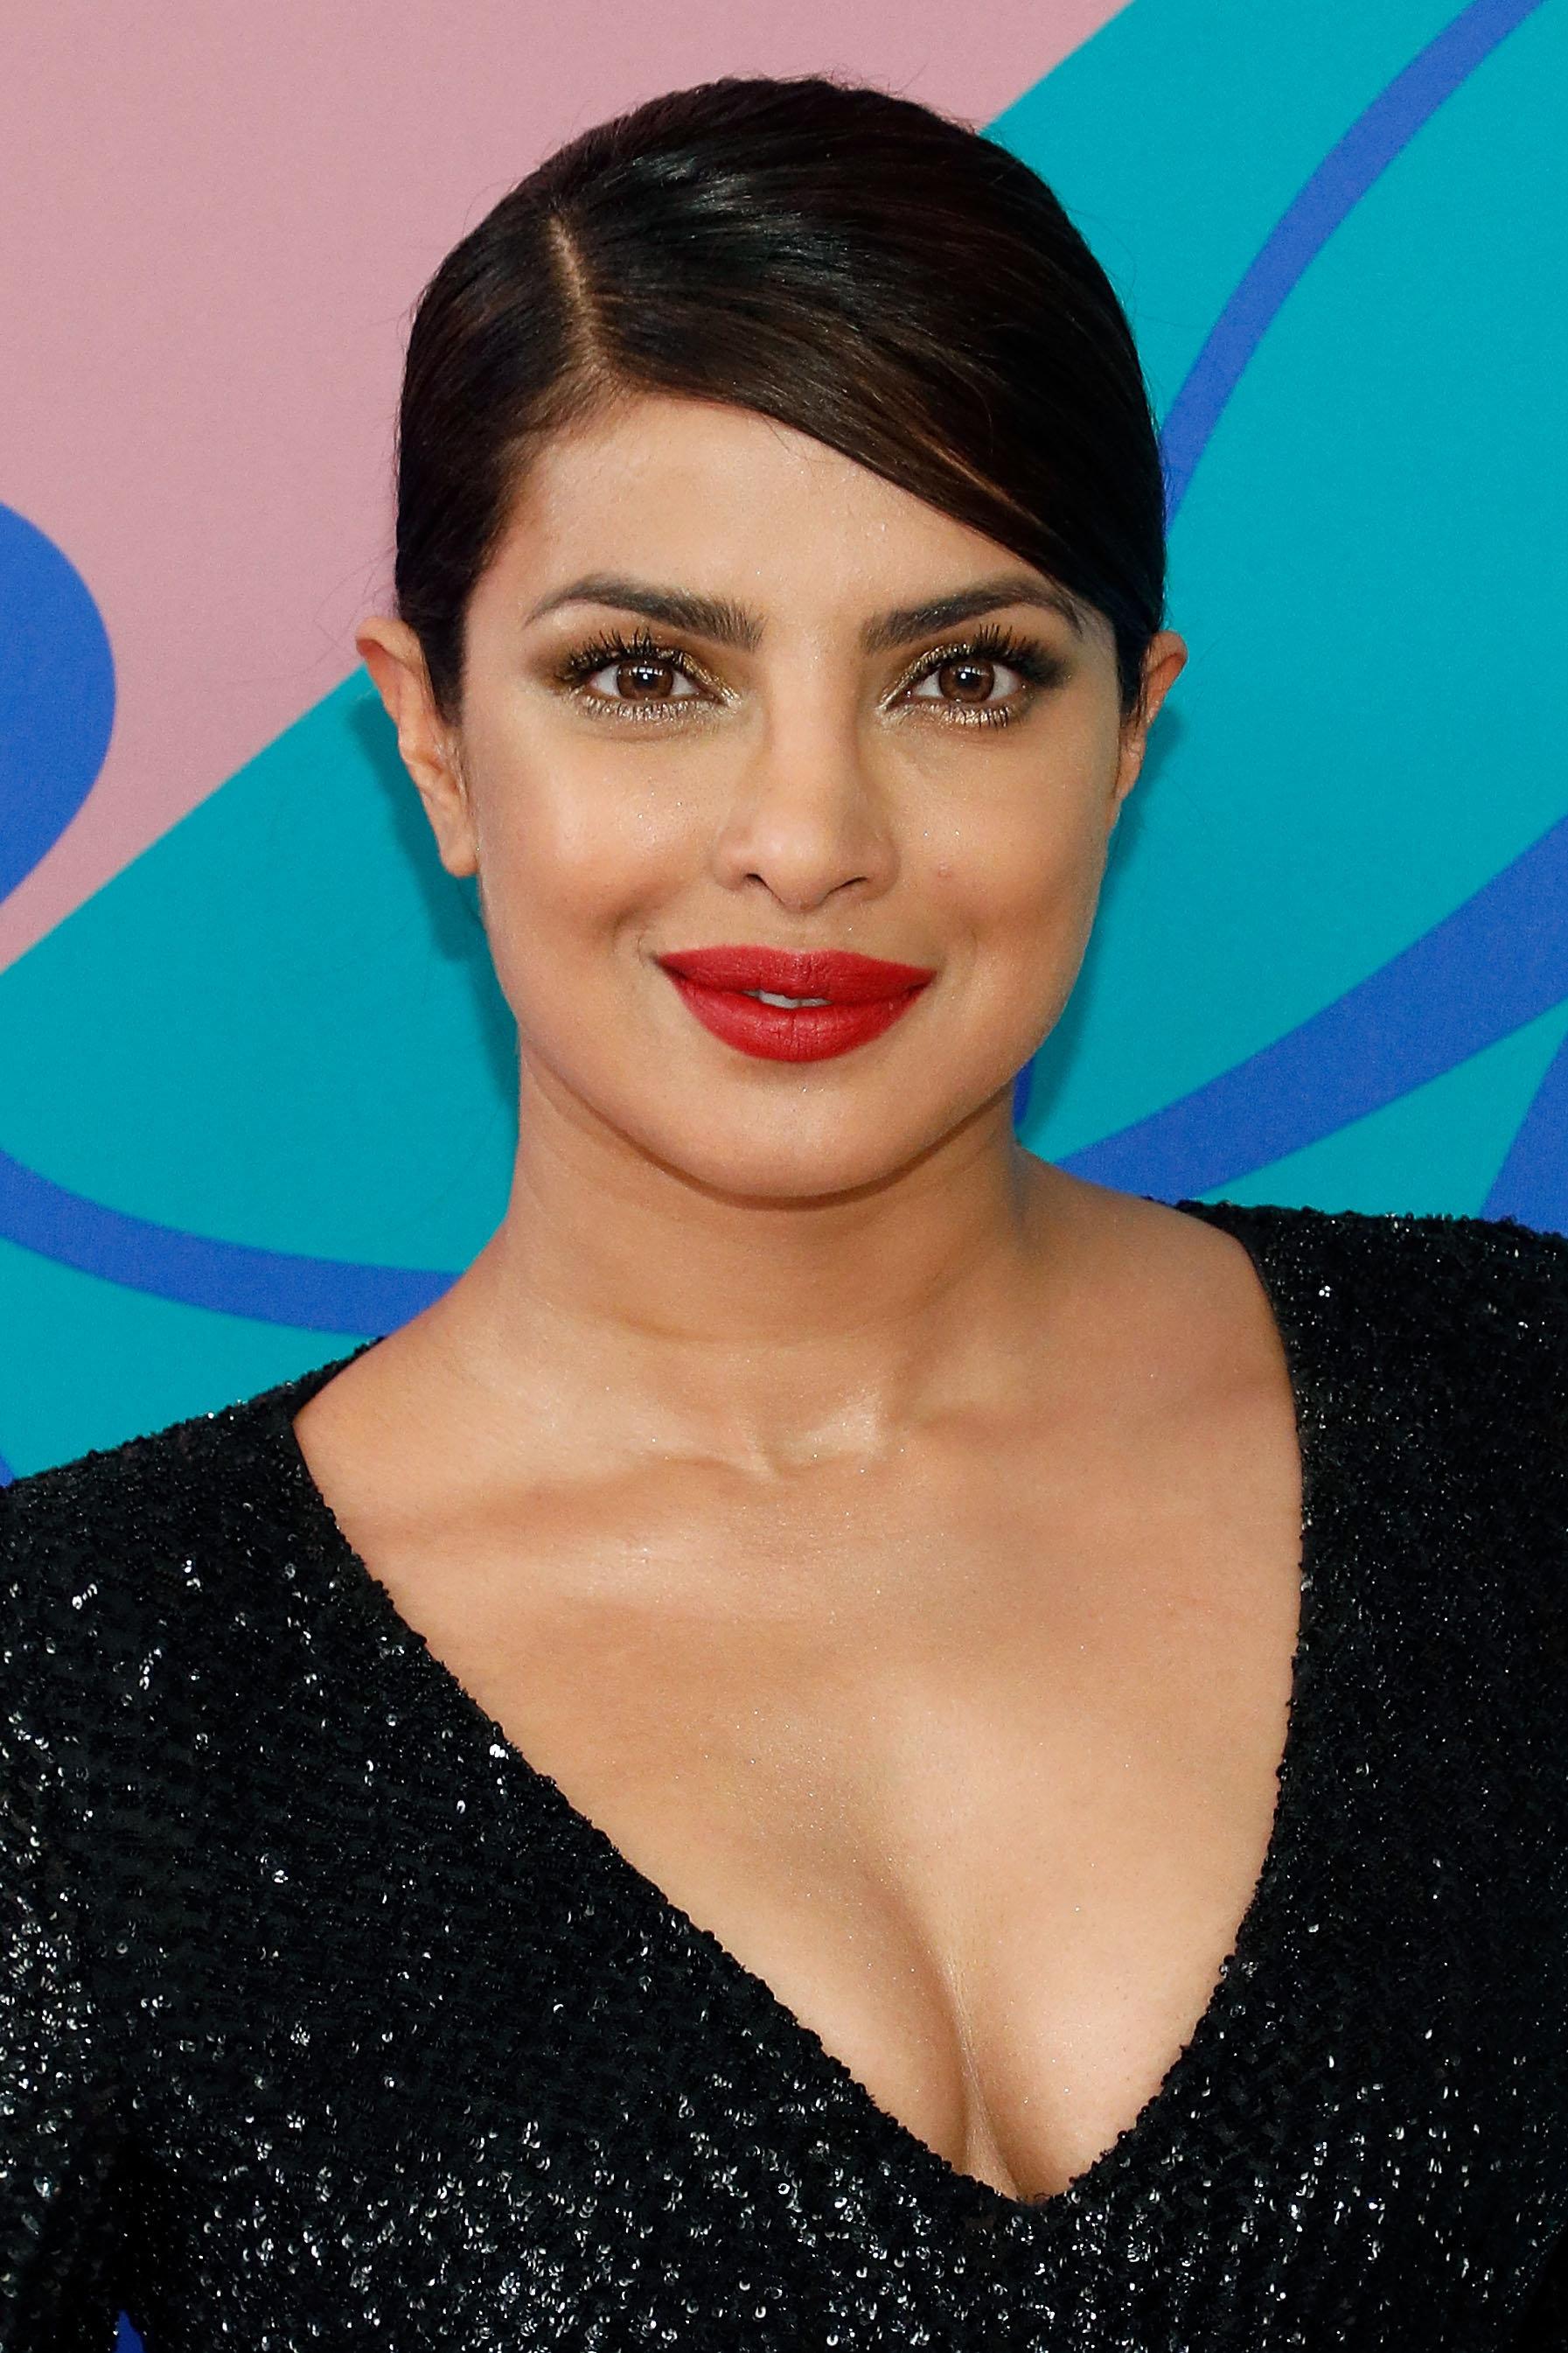 A Bollywood Sitcom With Priyanka Chopra Is Coming To